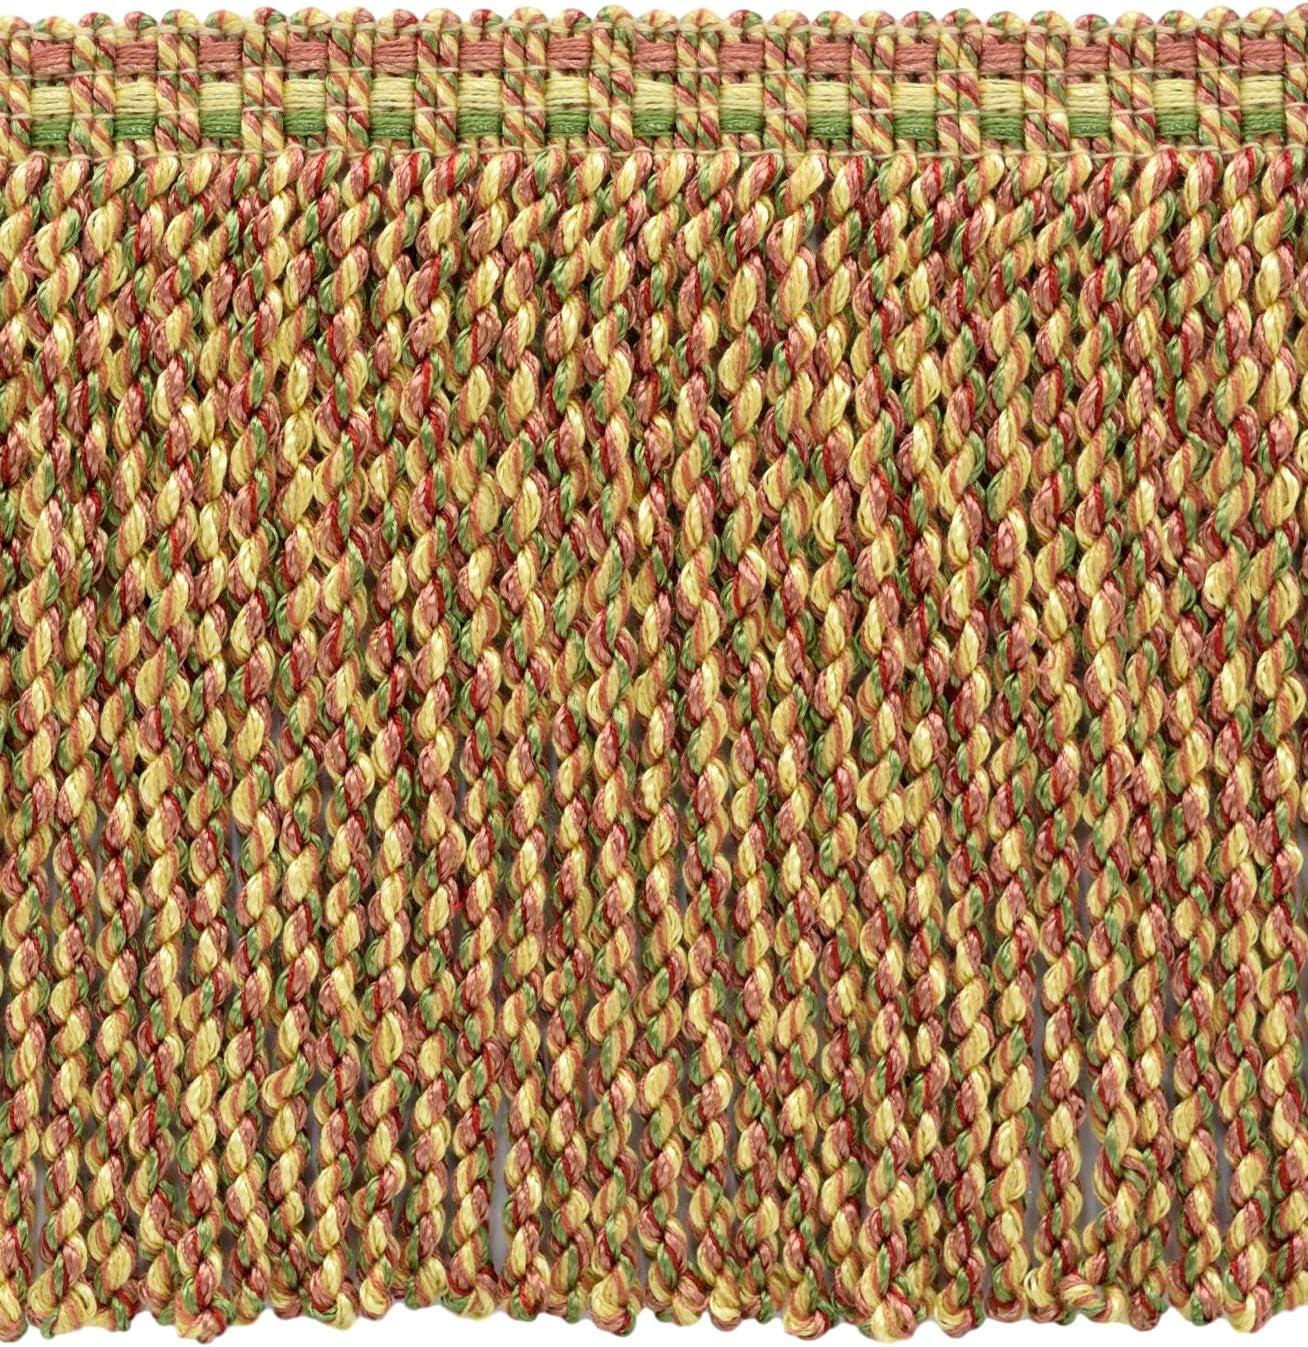 15cm D/ÉCOPRO 5 Yard Value Pack of Alpine Green Green Yellow Maize Decorative Bullion Fringe Style#: BFV6 Color: VNT8 Light Brick 6 inch Daylily Bouquet